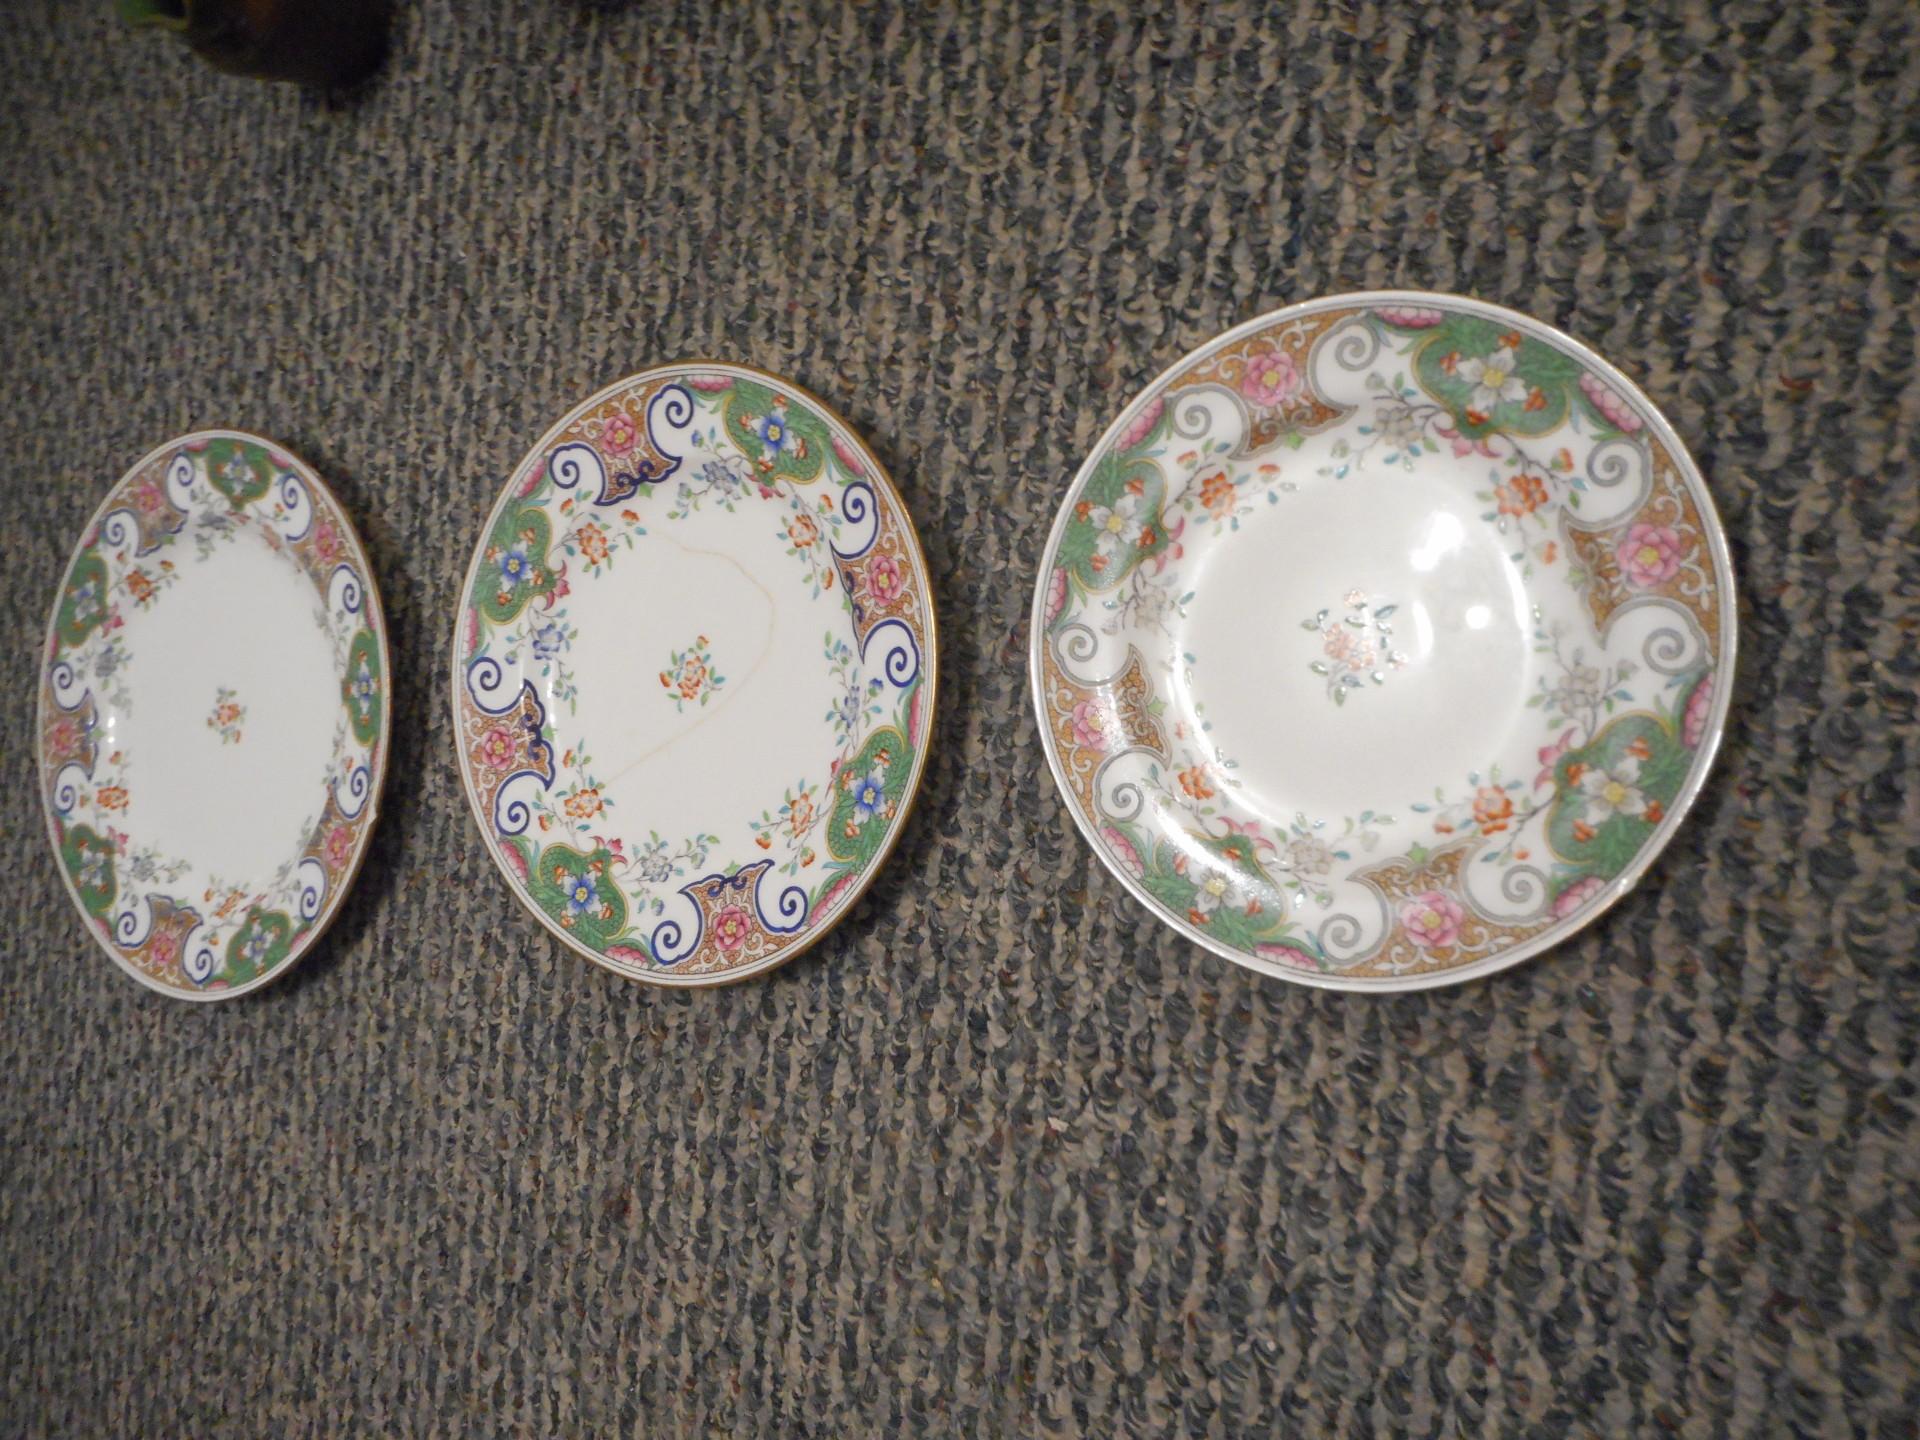 R. Briggs & Co. Boston Made in England - Three Plates